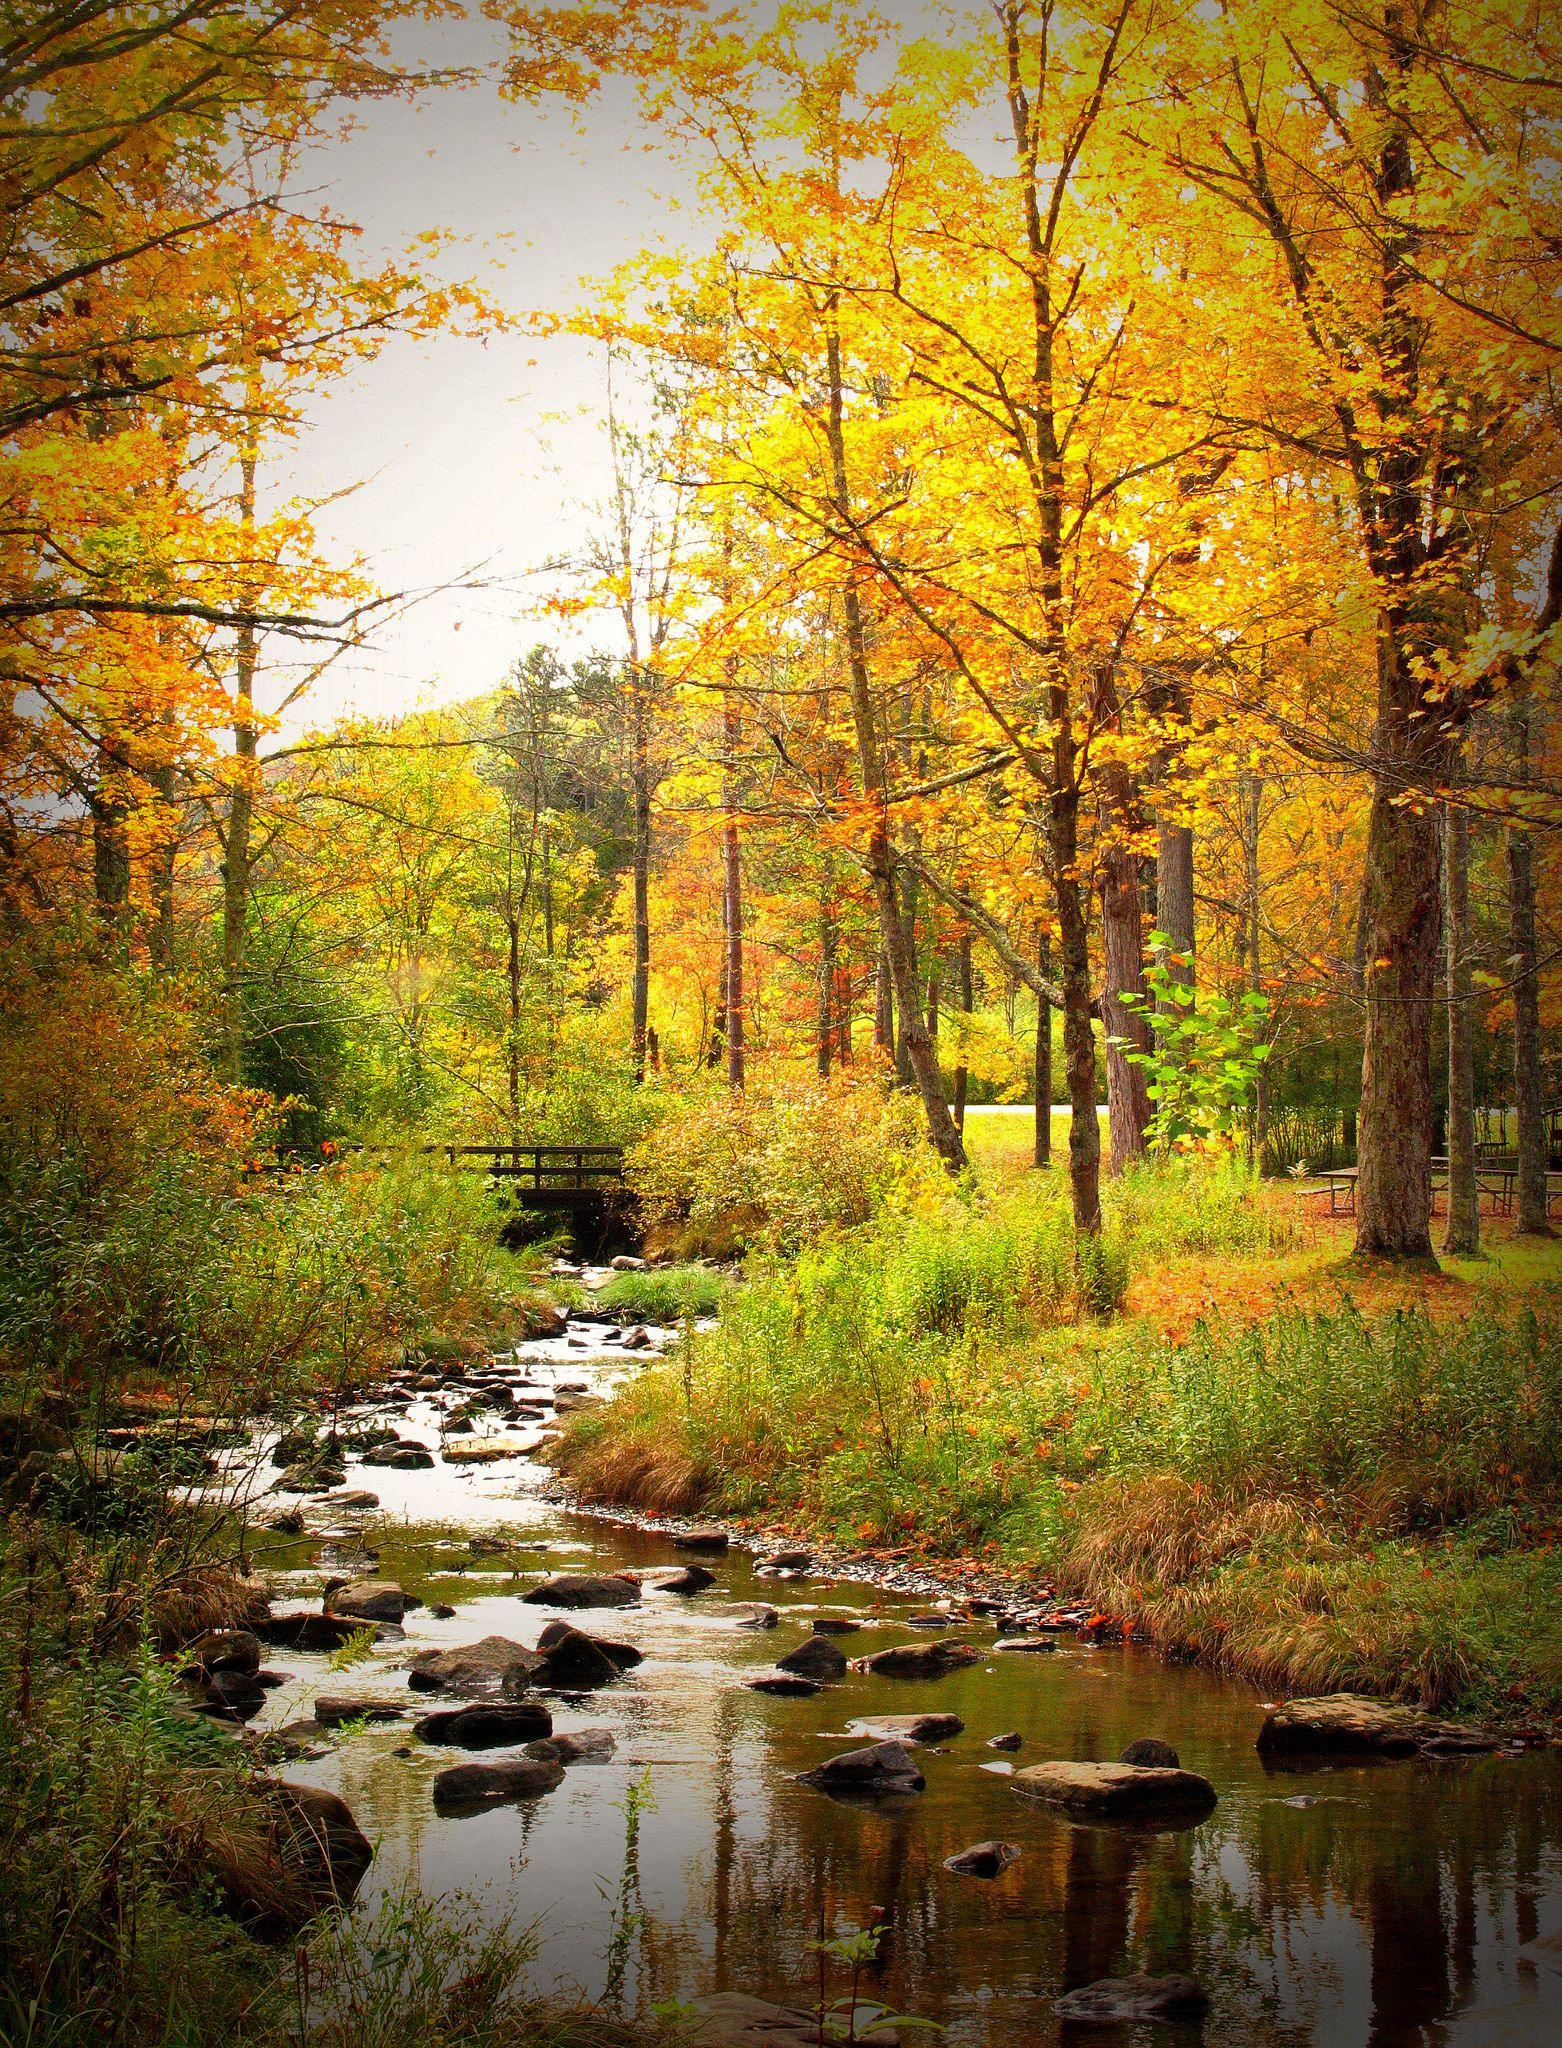 14 Rivers Amp Landscape Photos Ideas In 2021 Landscape Scenery